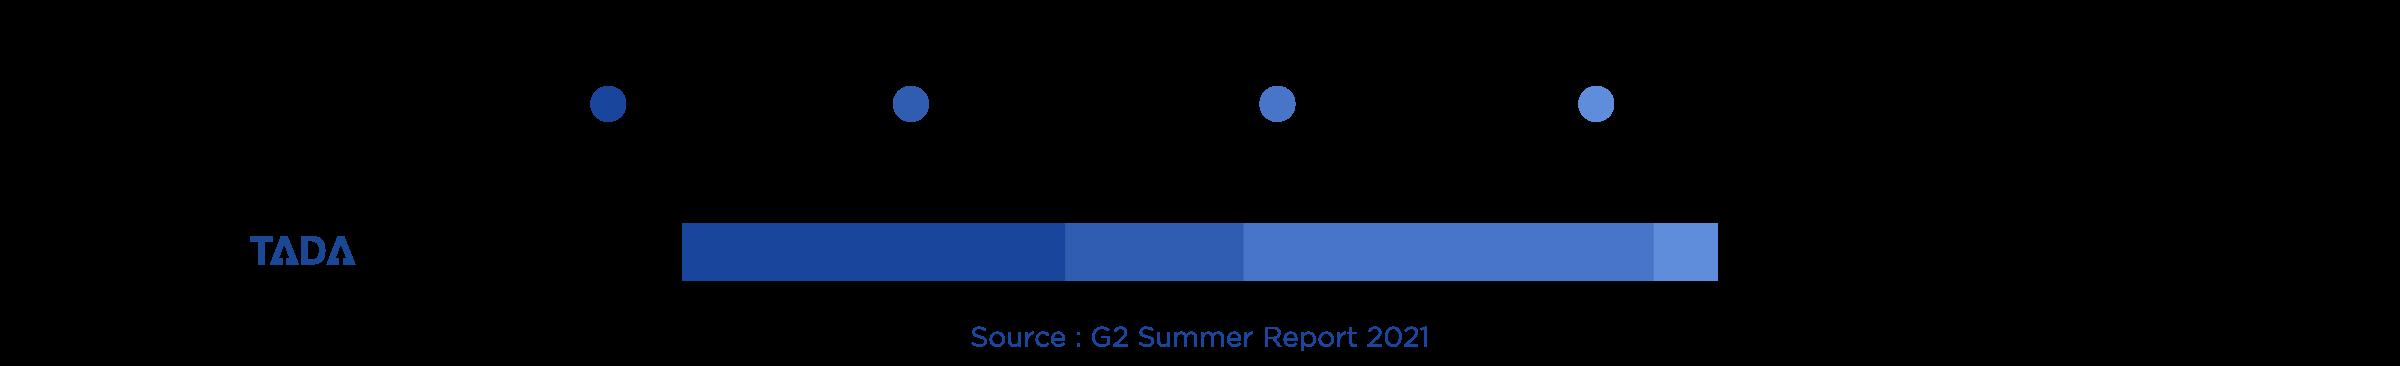 TADA G2 Relationship Index